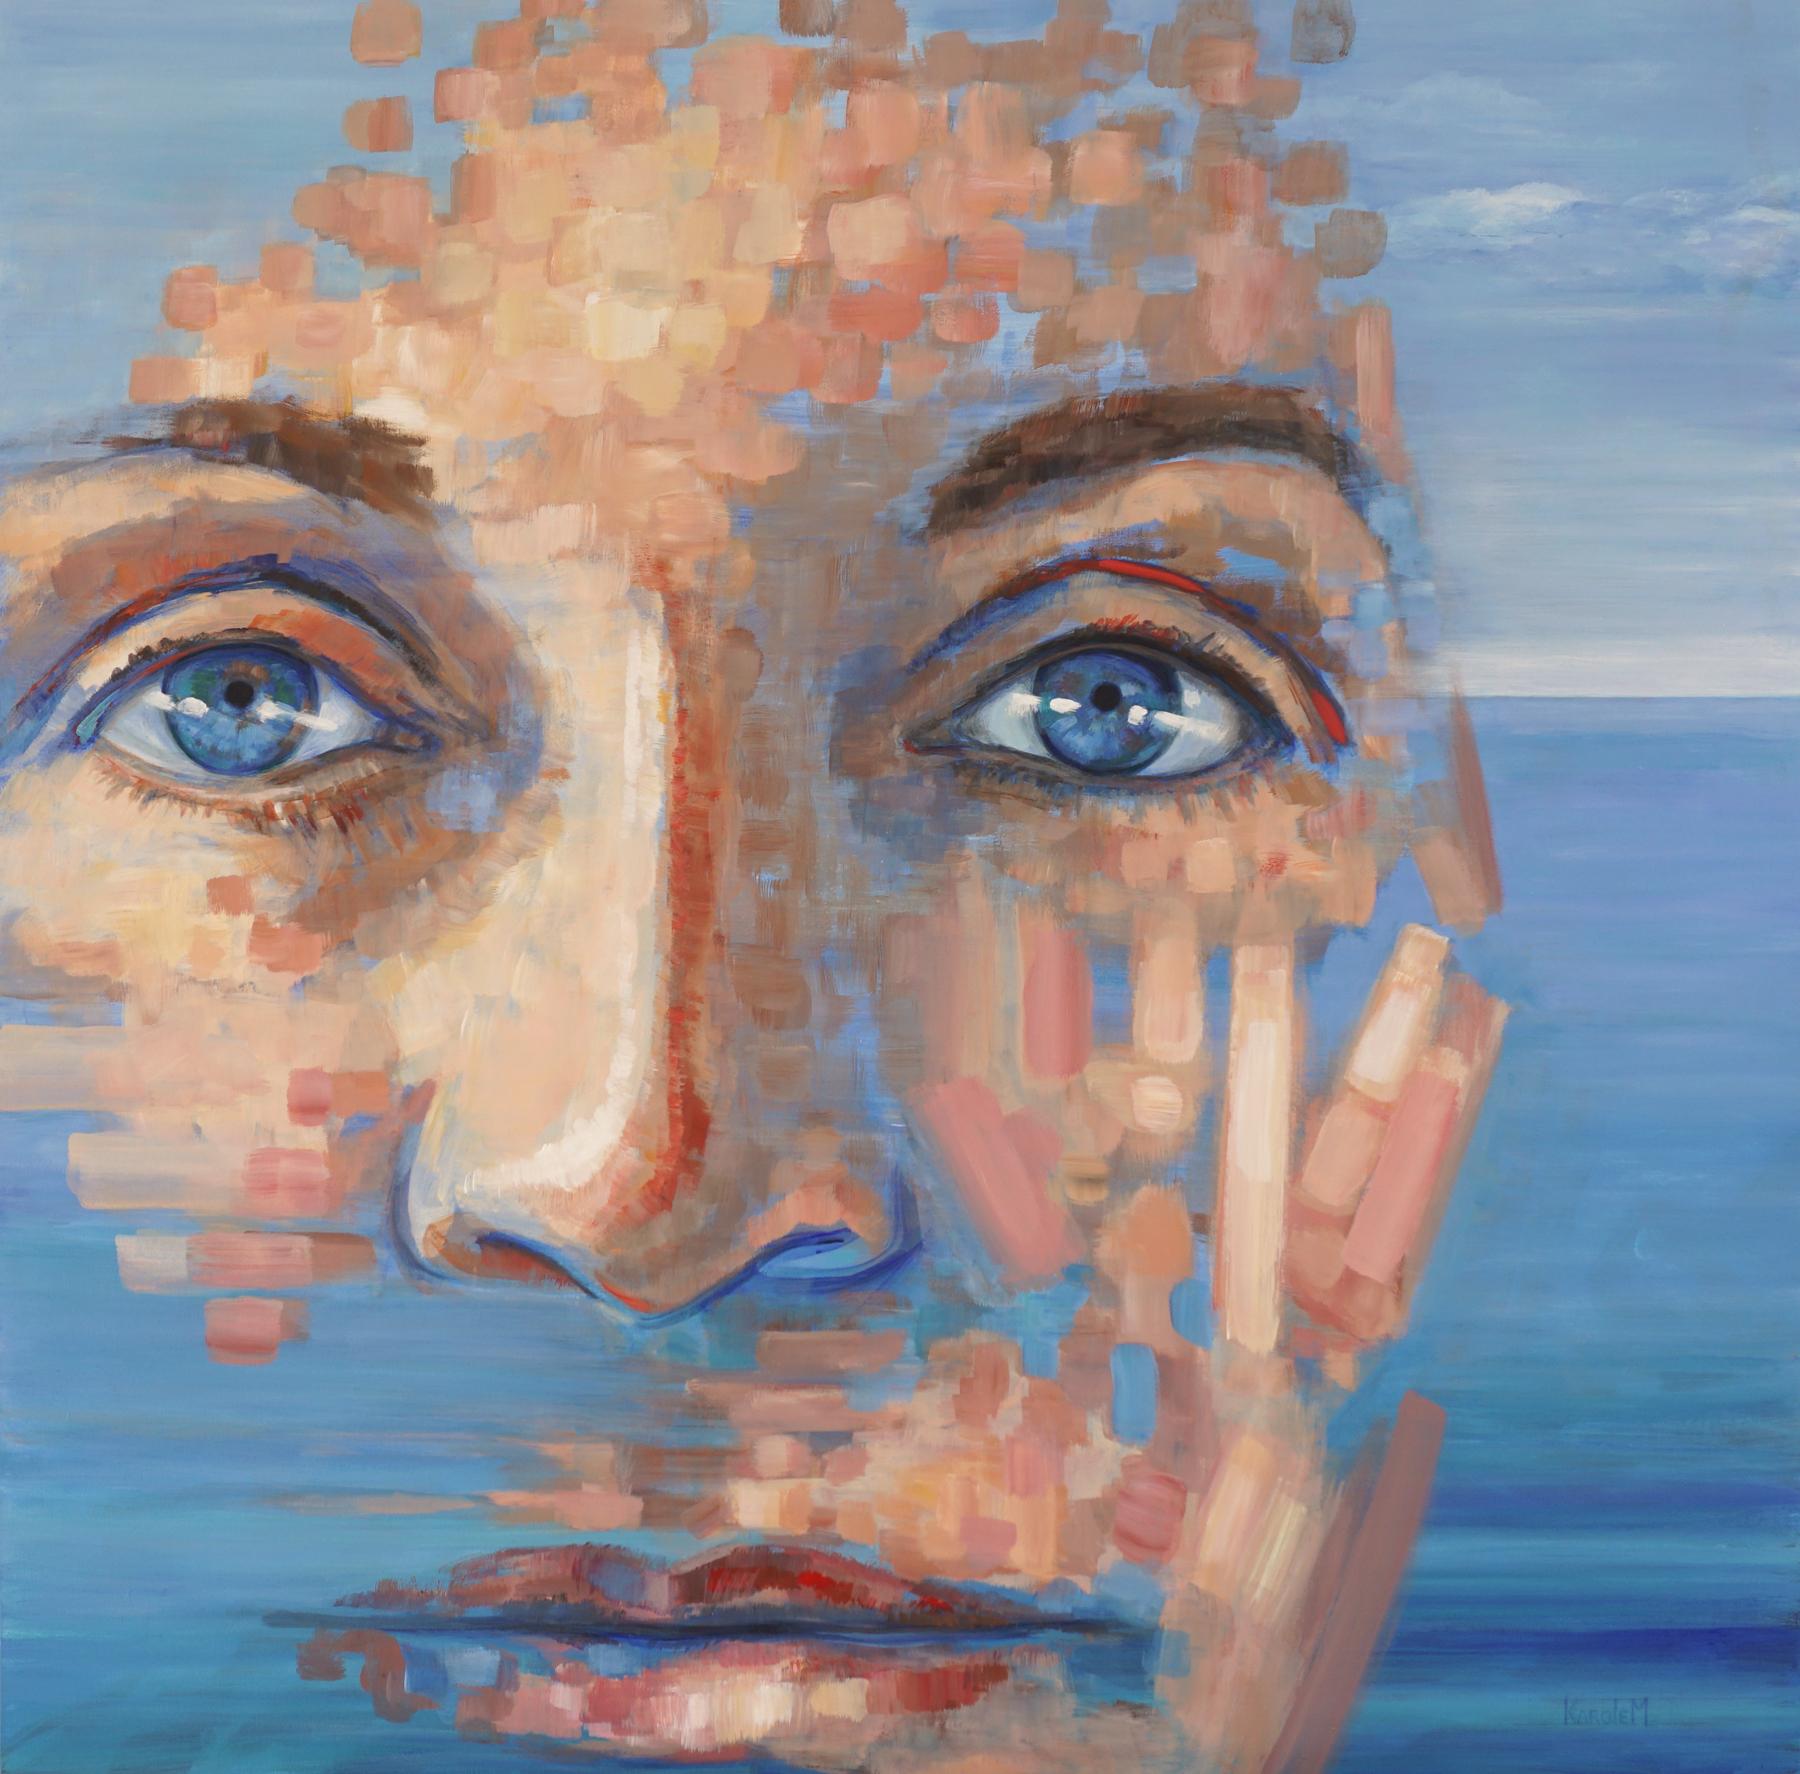 "In Osmosis, acrylic on wood, 48 x 48"", 122 x 122 cm, 2018, $3500"